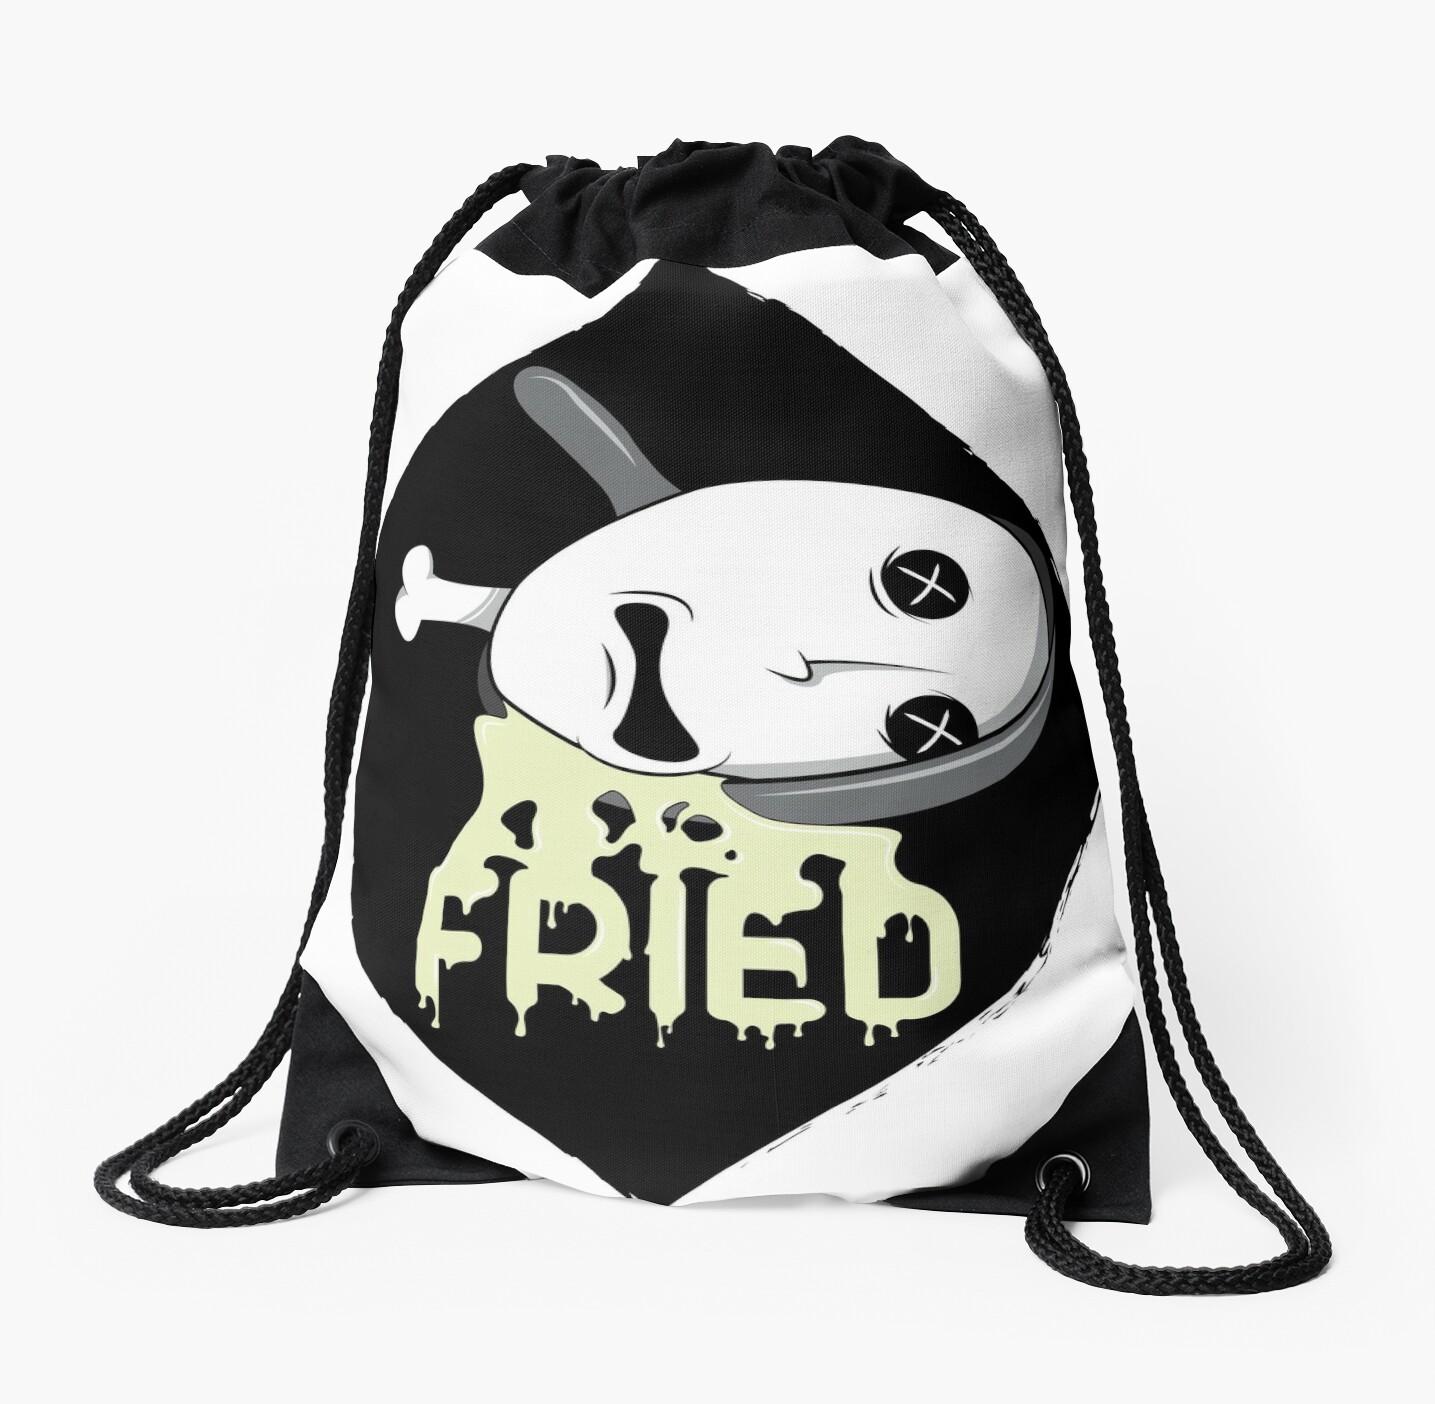 I fried my brain  by UglyMess